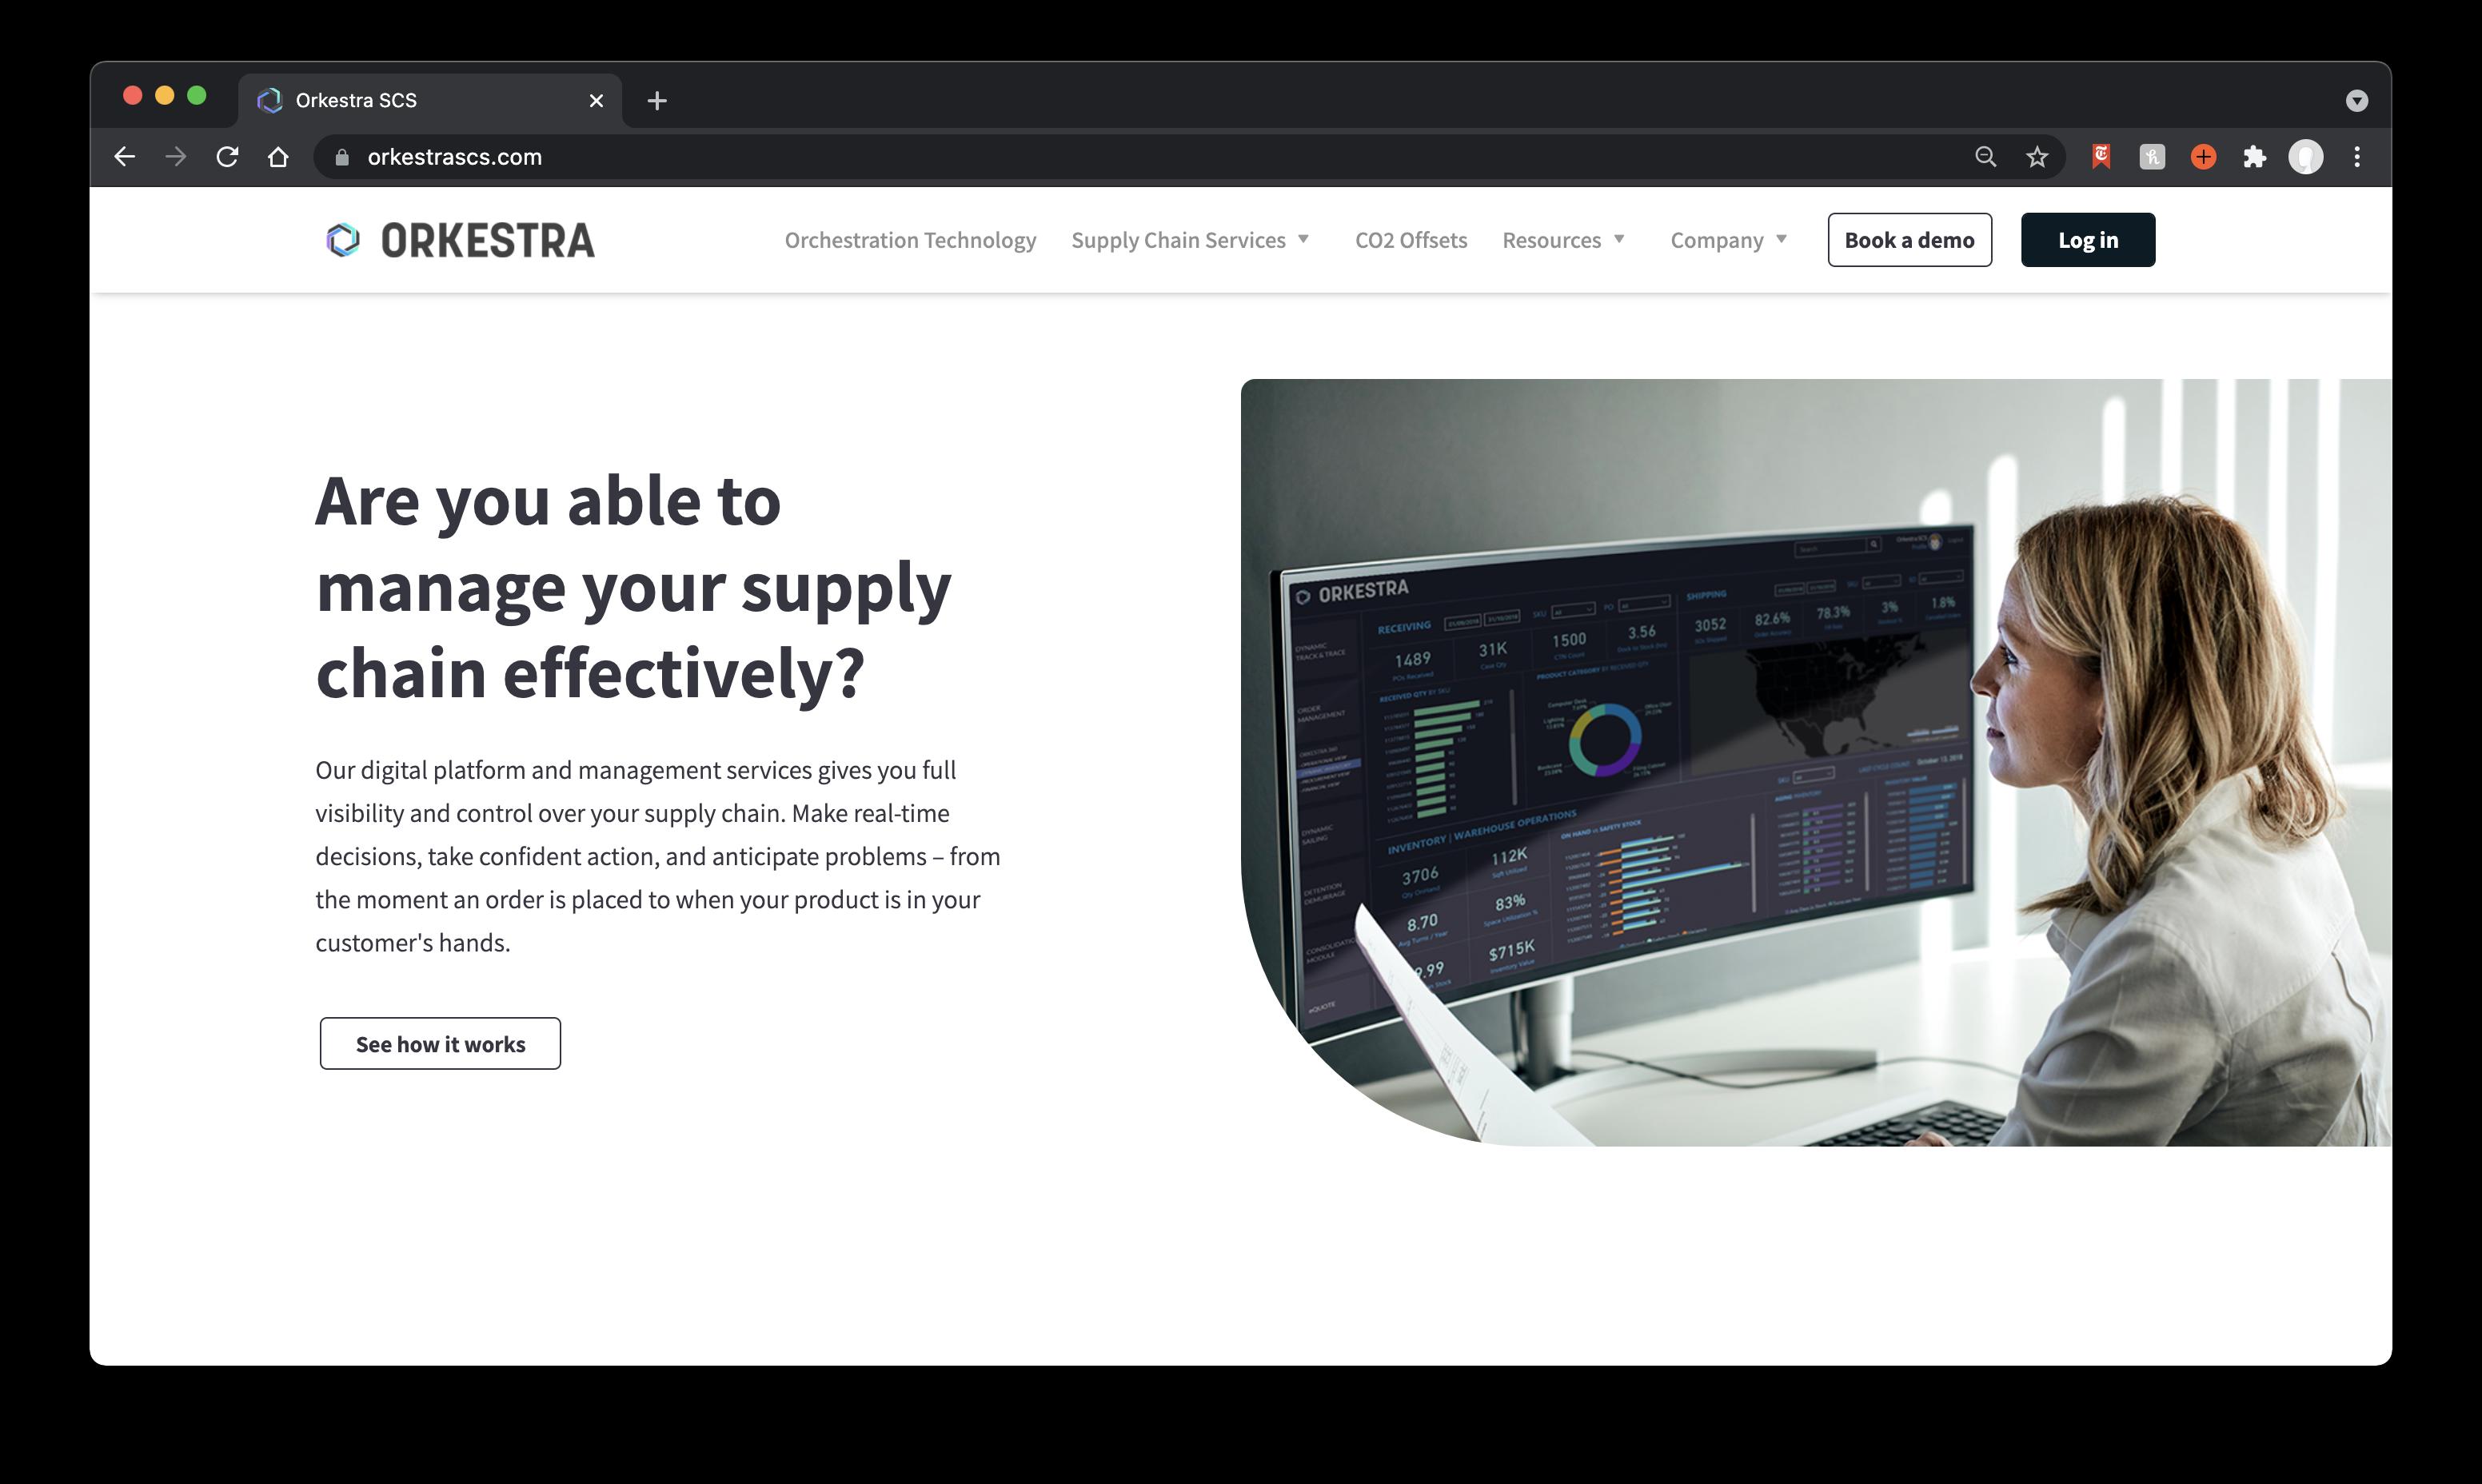 Orkestra SCS Website